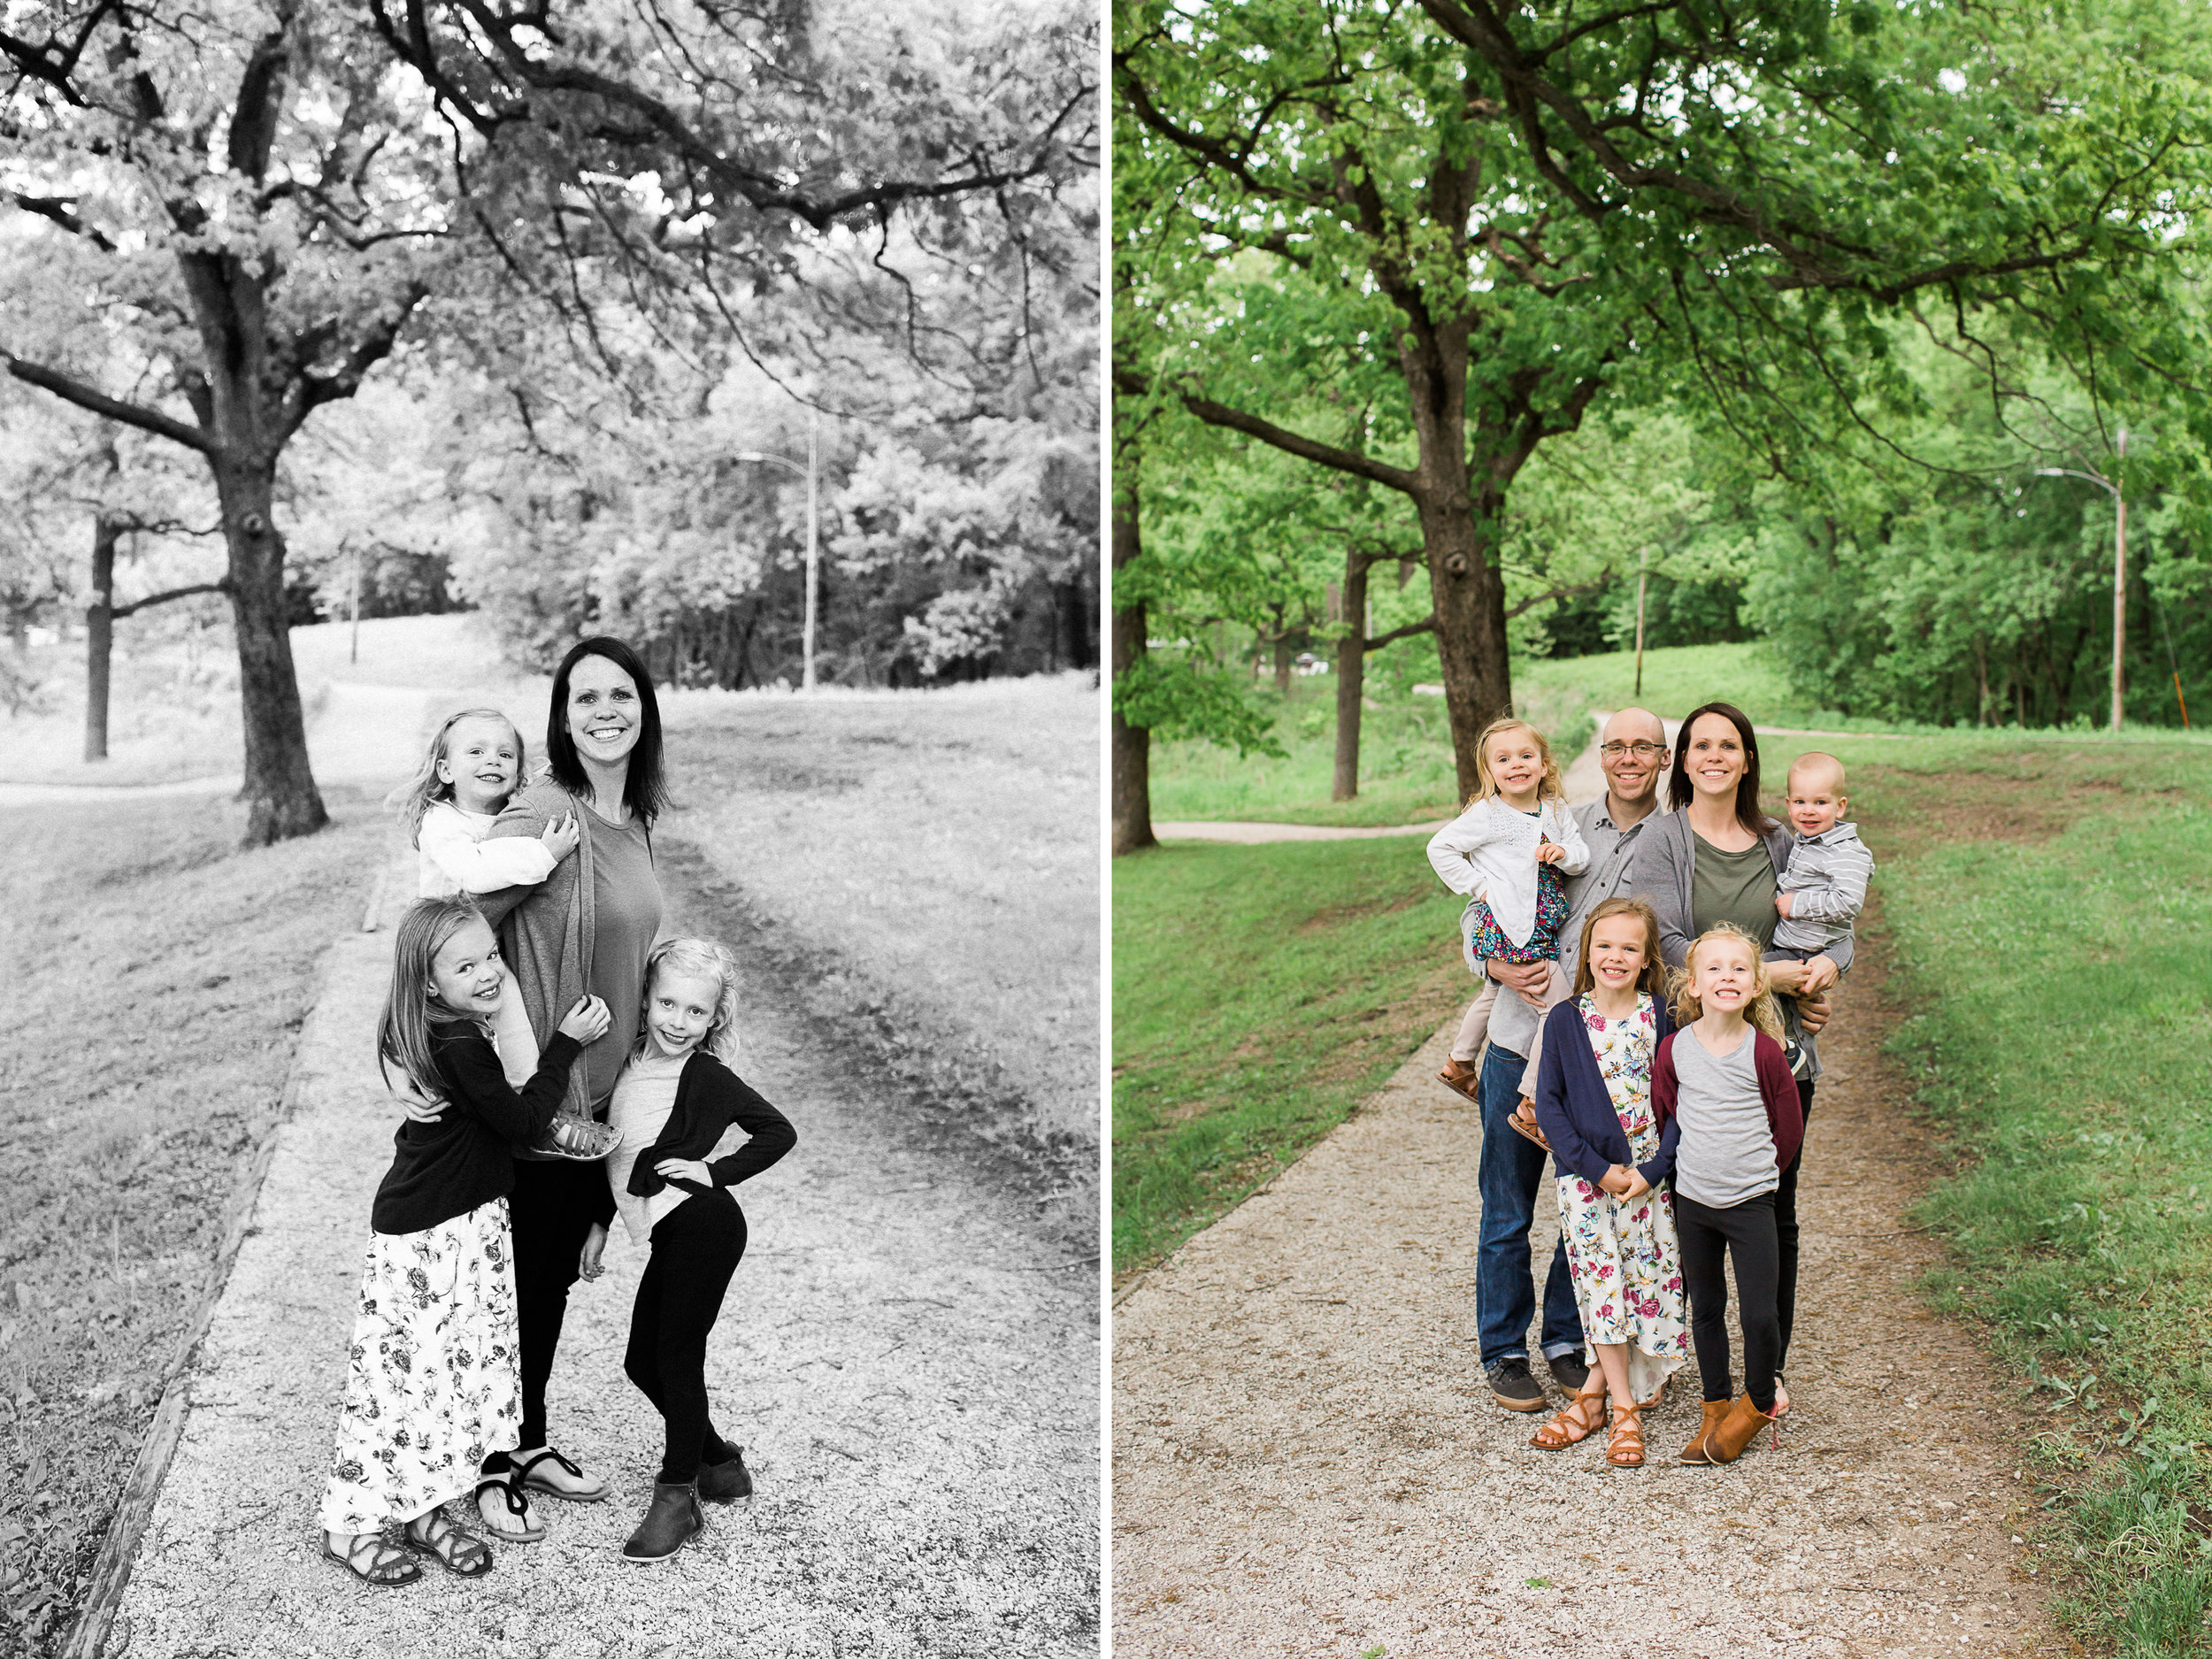 greenwoodparkfamilysession-4.jpg